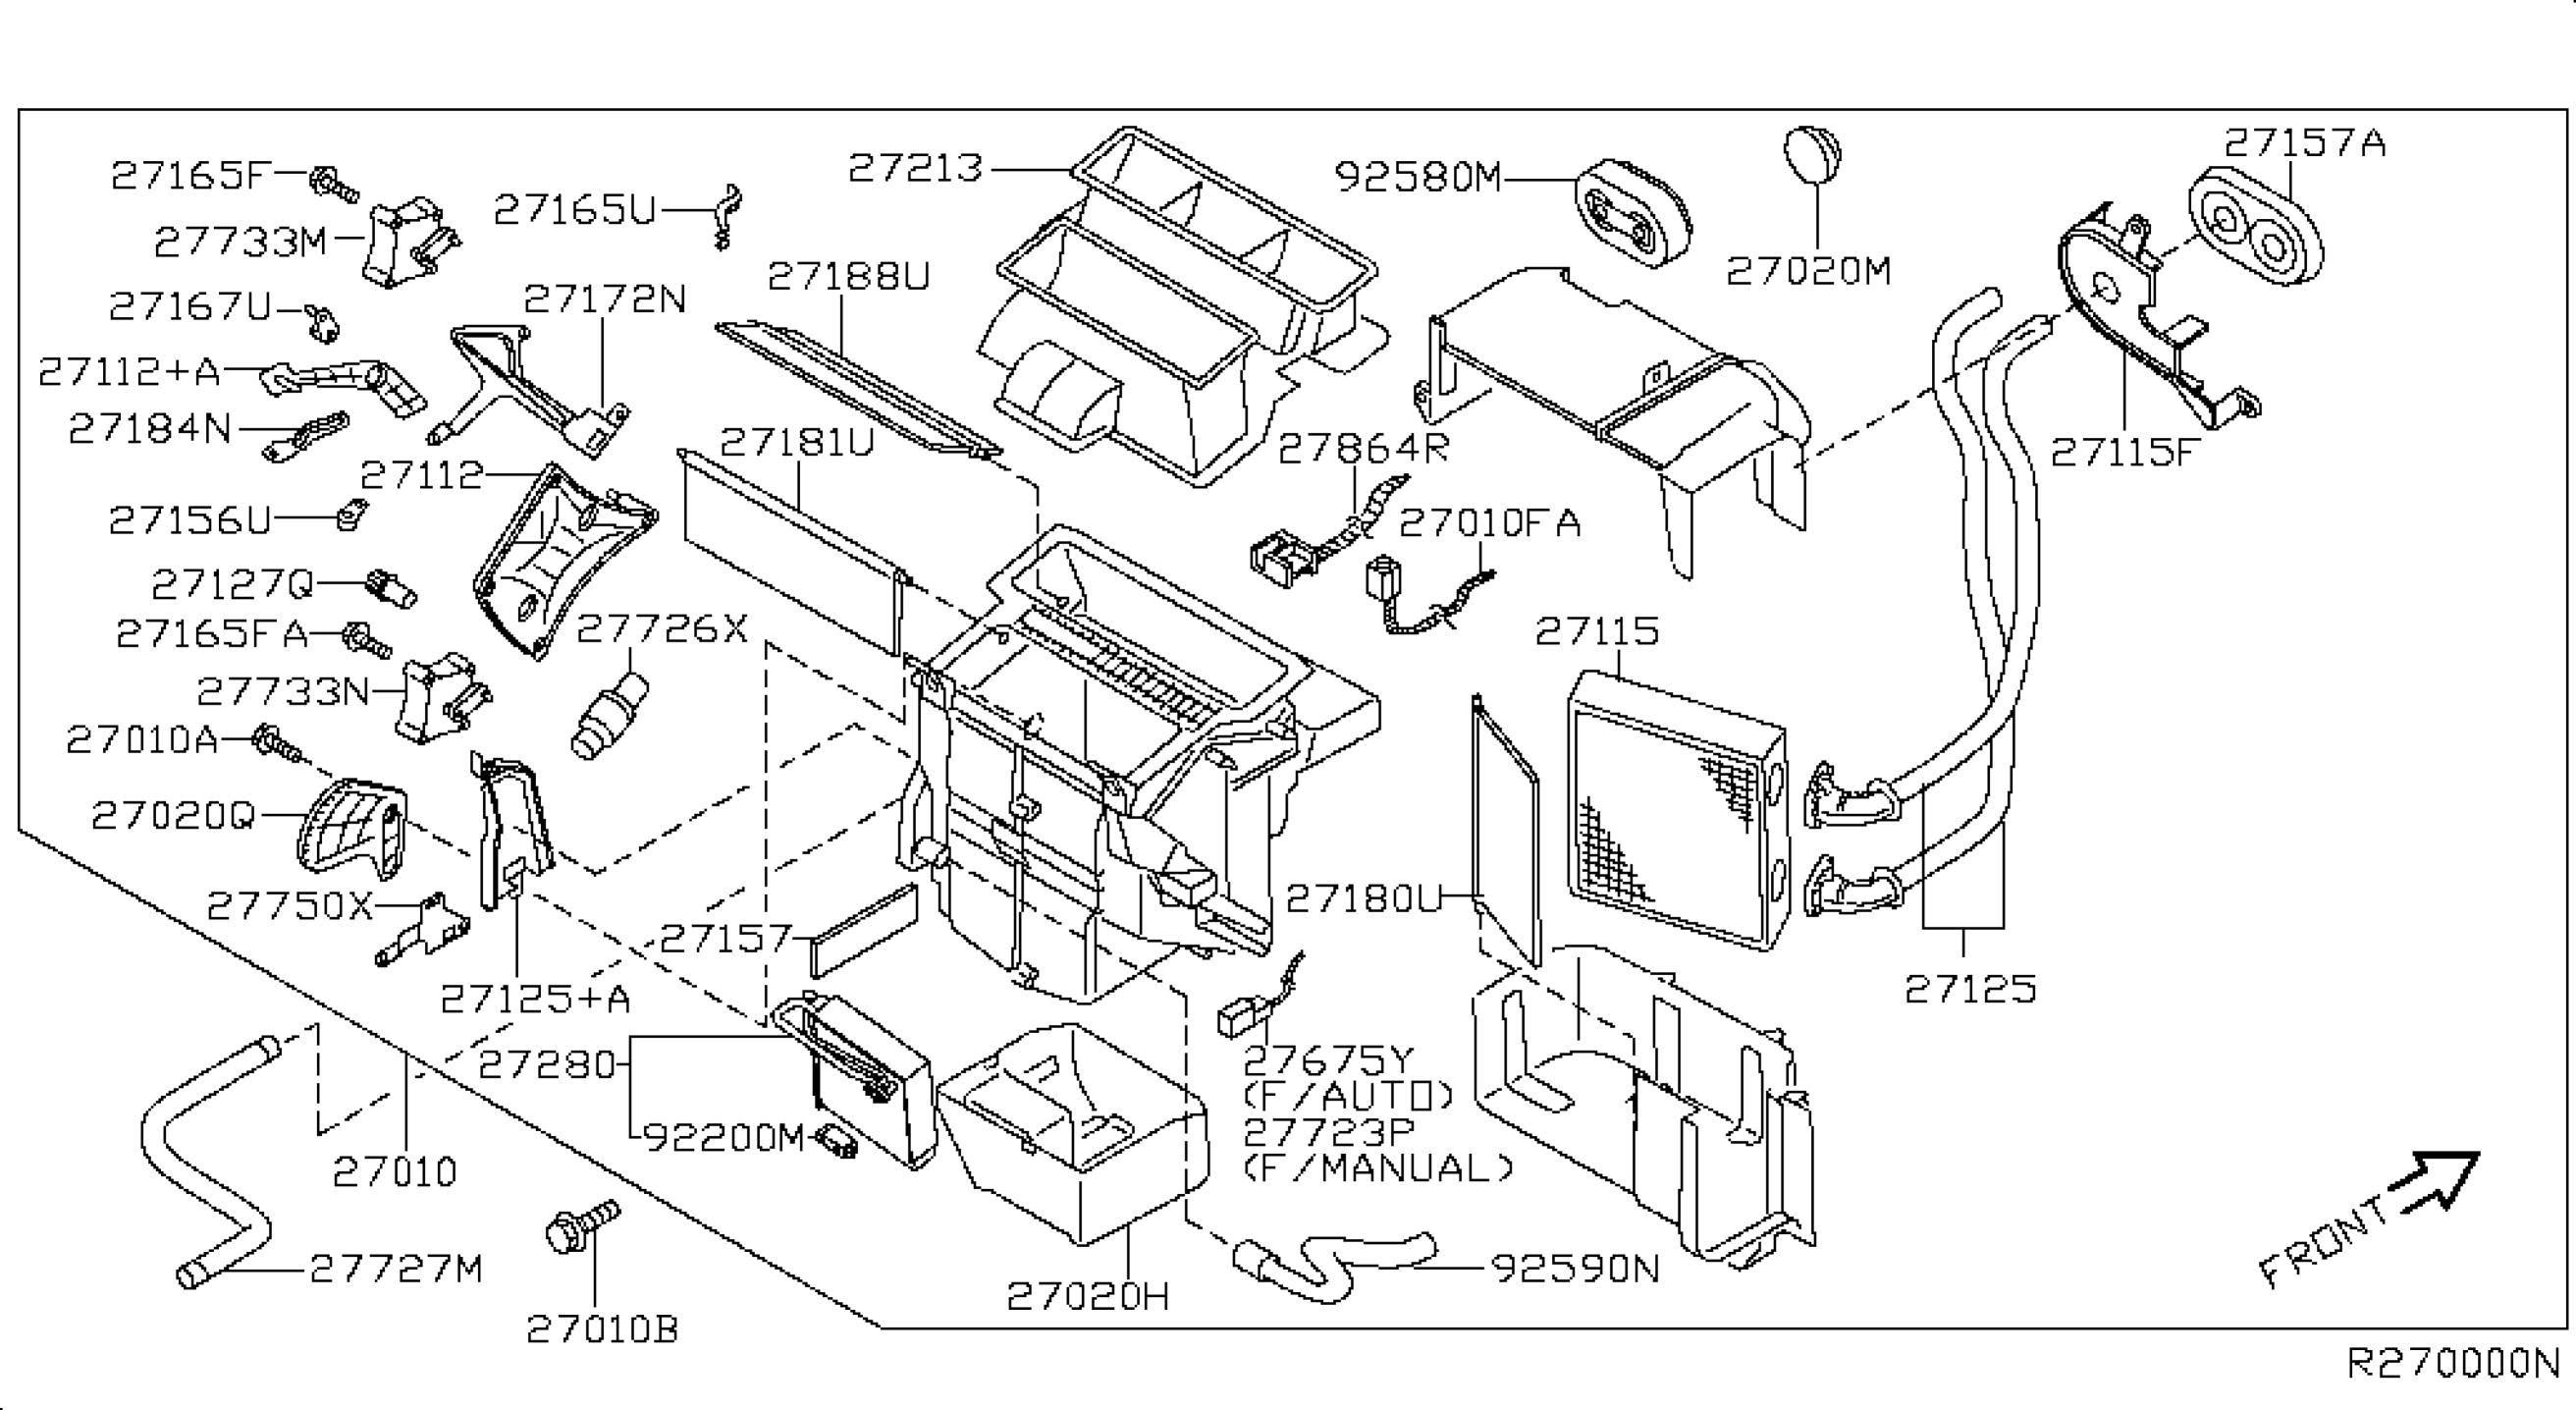 2007 Altima 25 Belt Diagram Diagram Base Website Belt Diagram Diagramtemplateword Verosassi It